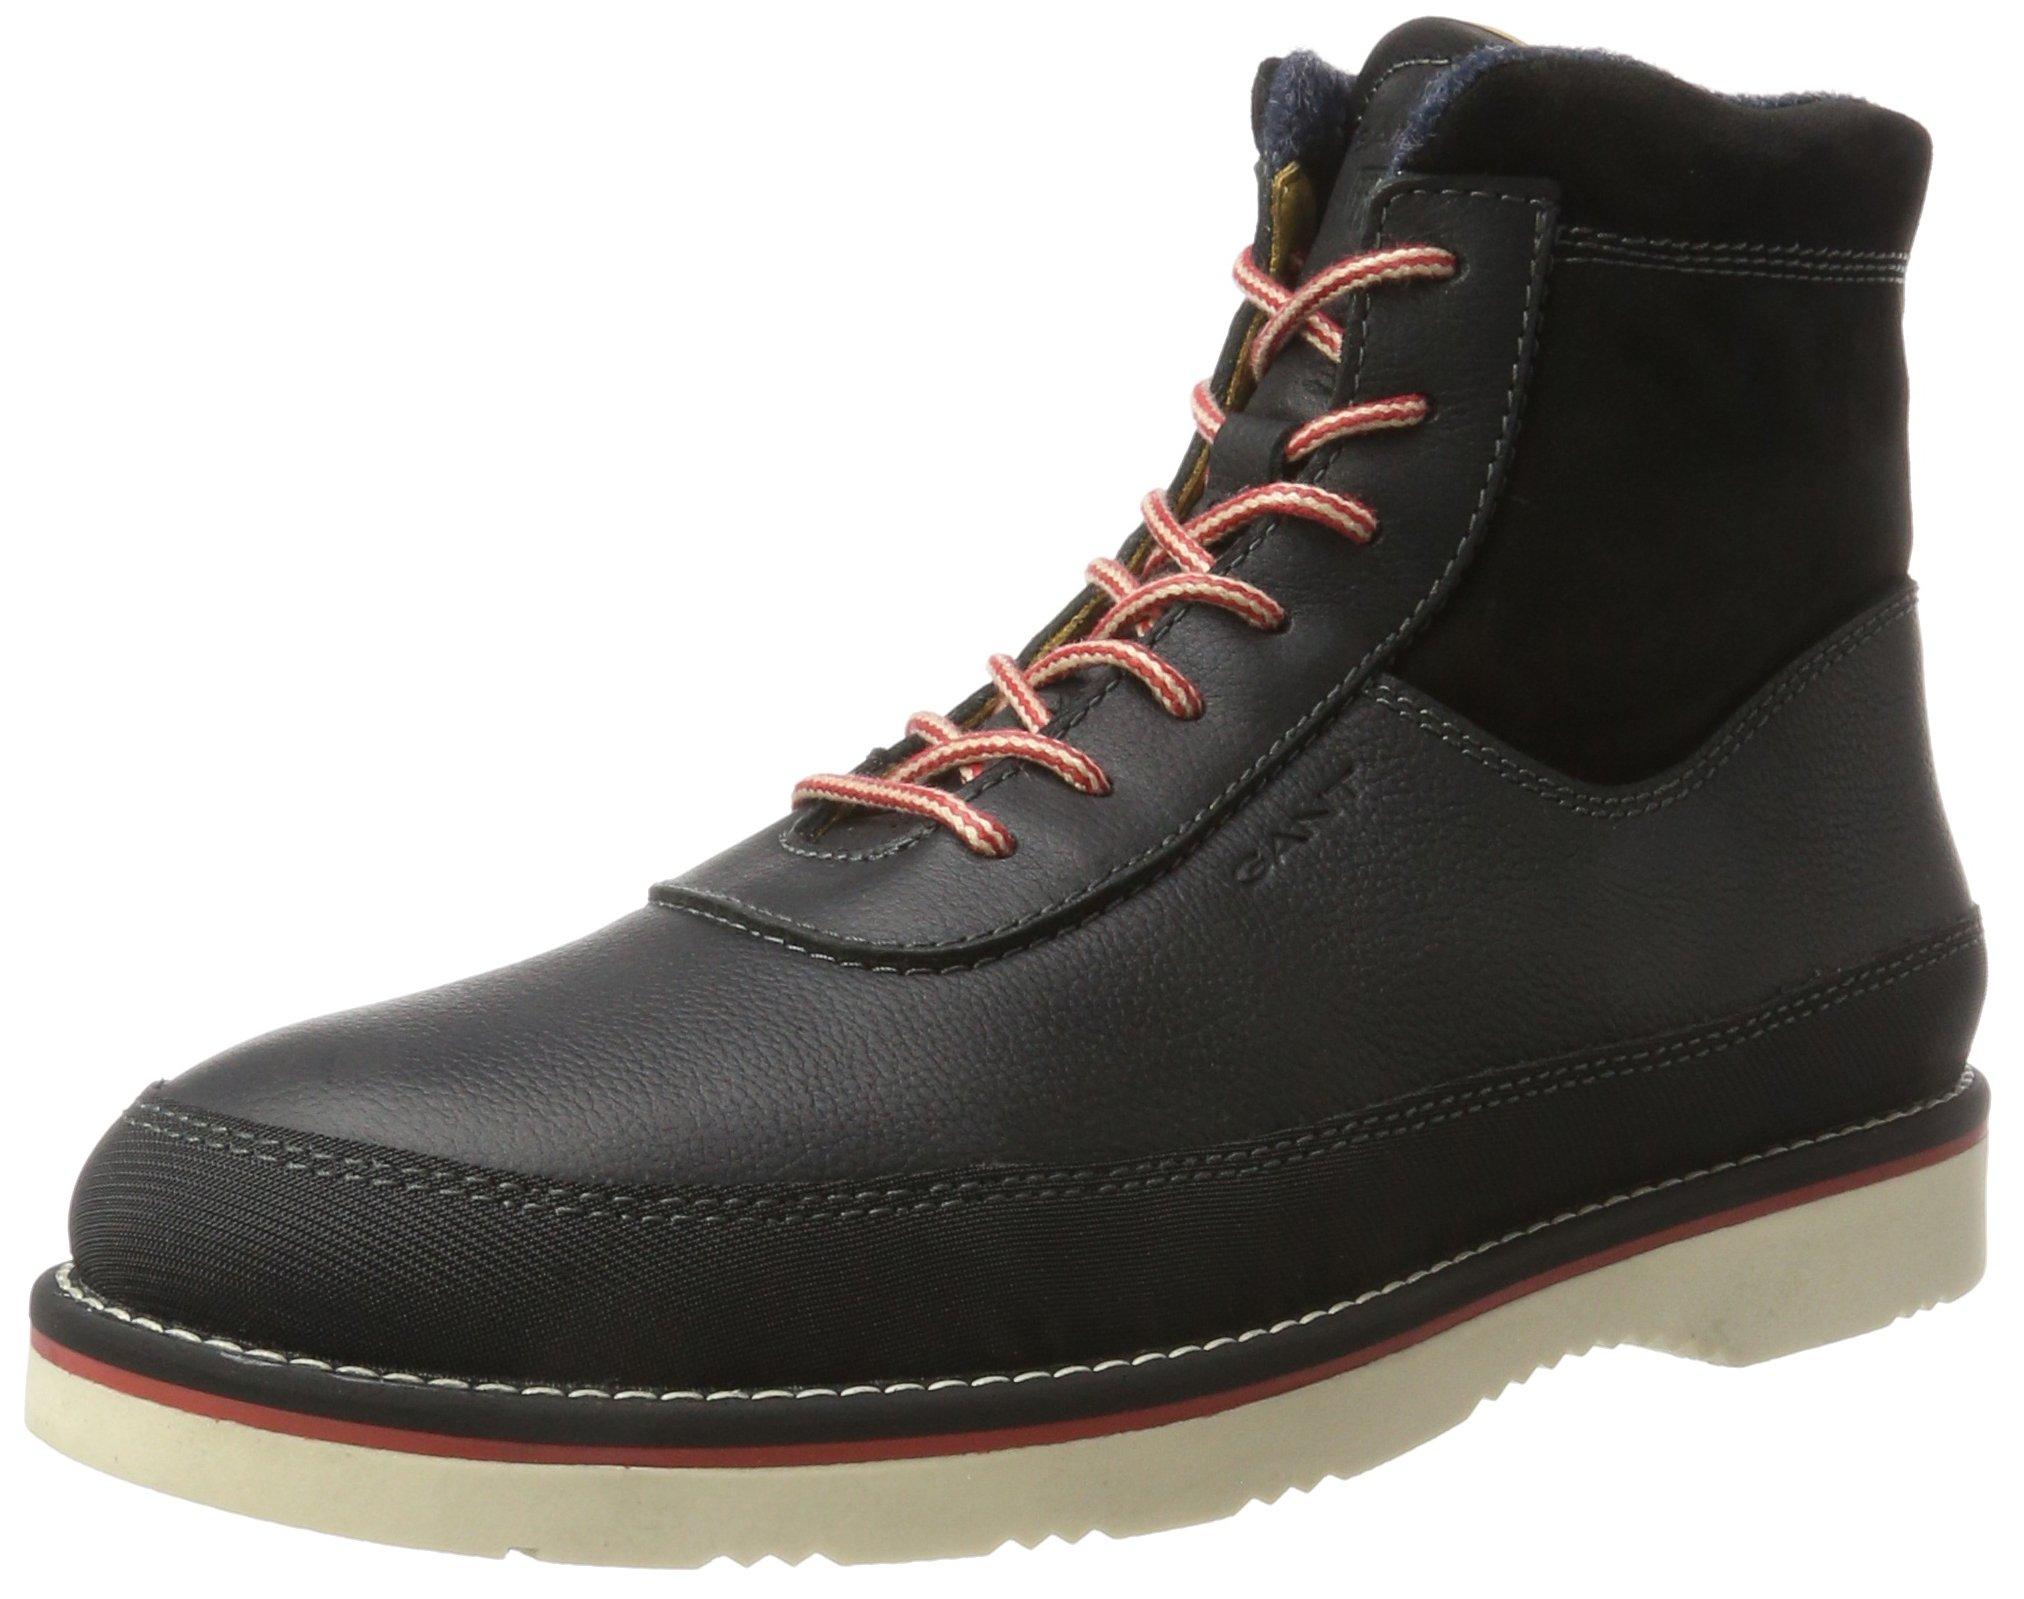 HuckChukka Eu Gant HommeNoirblack Boots G0044 iTwOXZPku